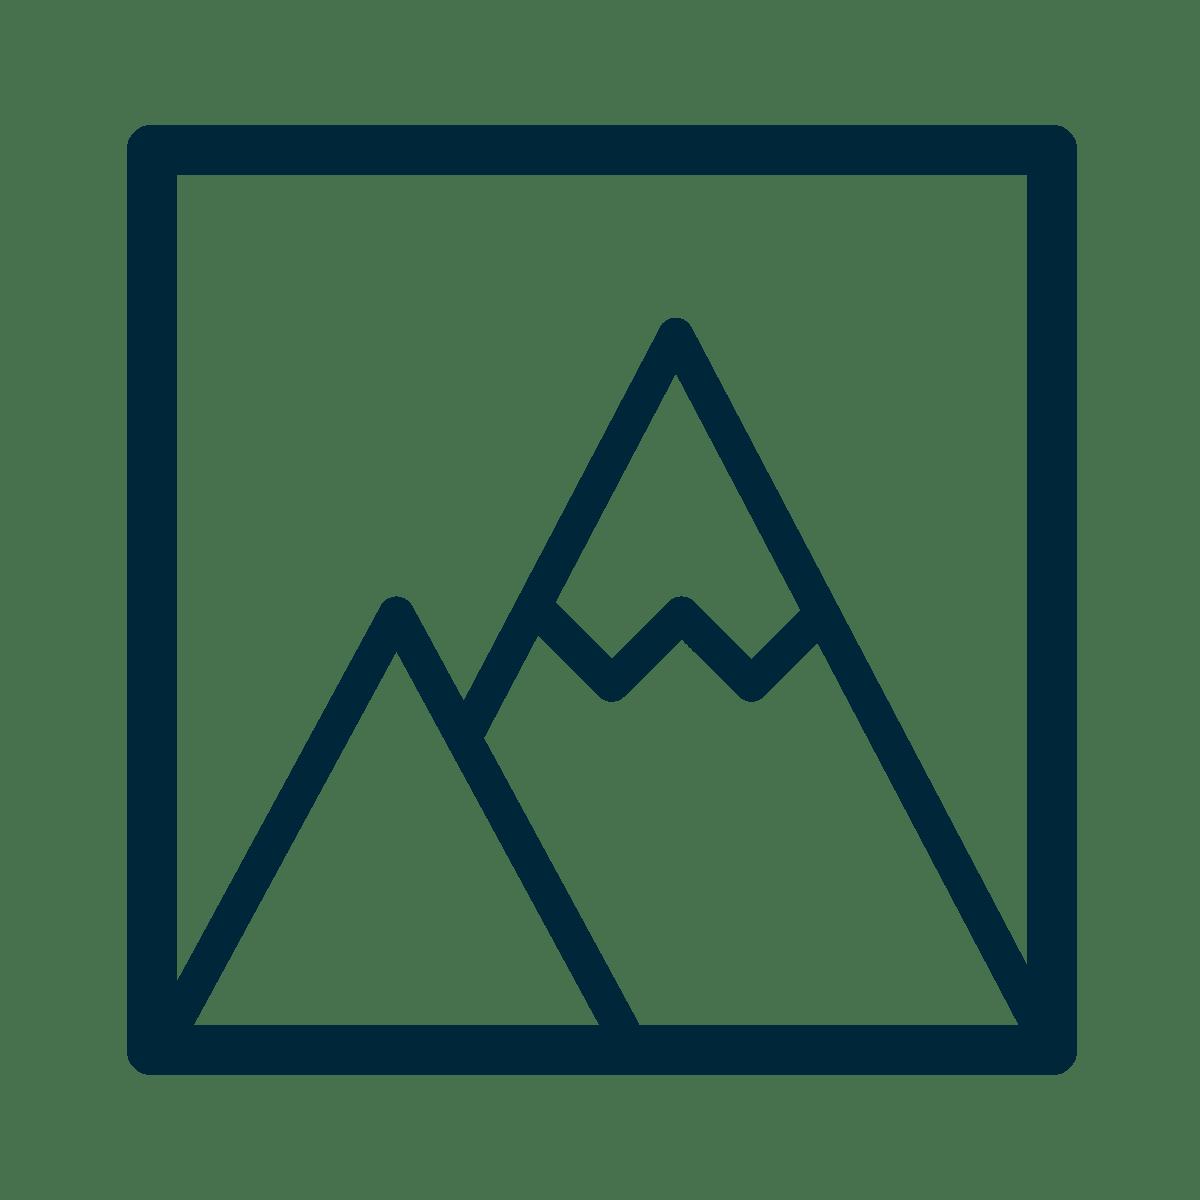 Finestre sulle montagne